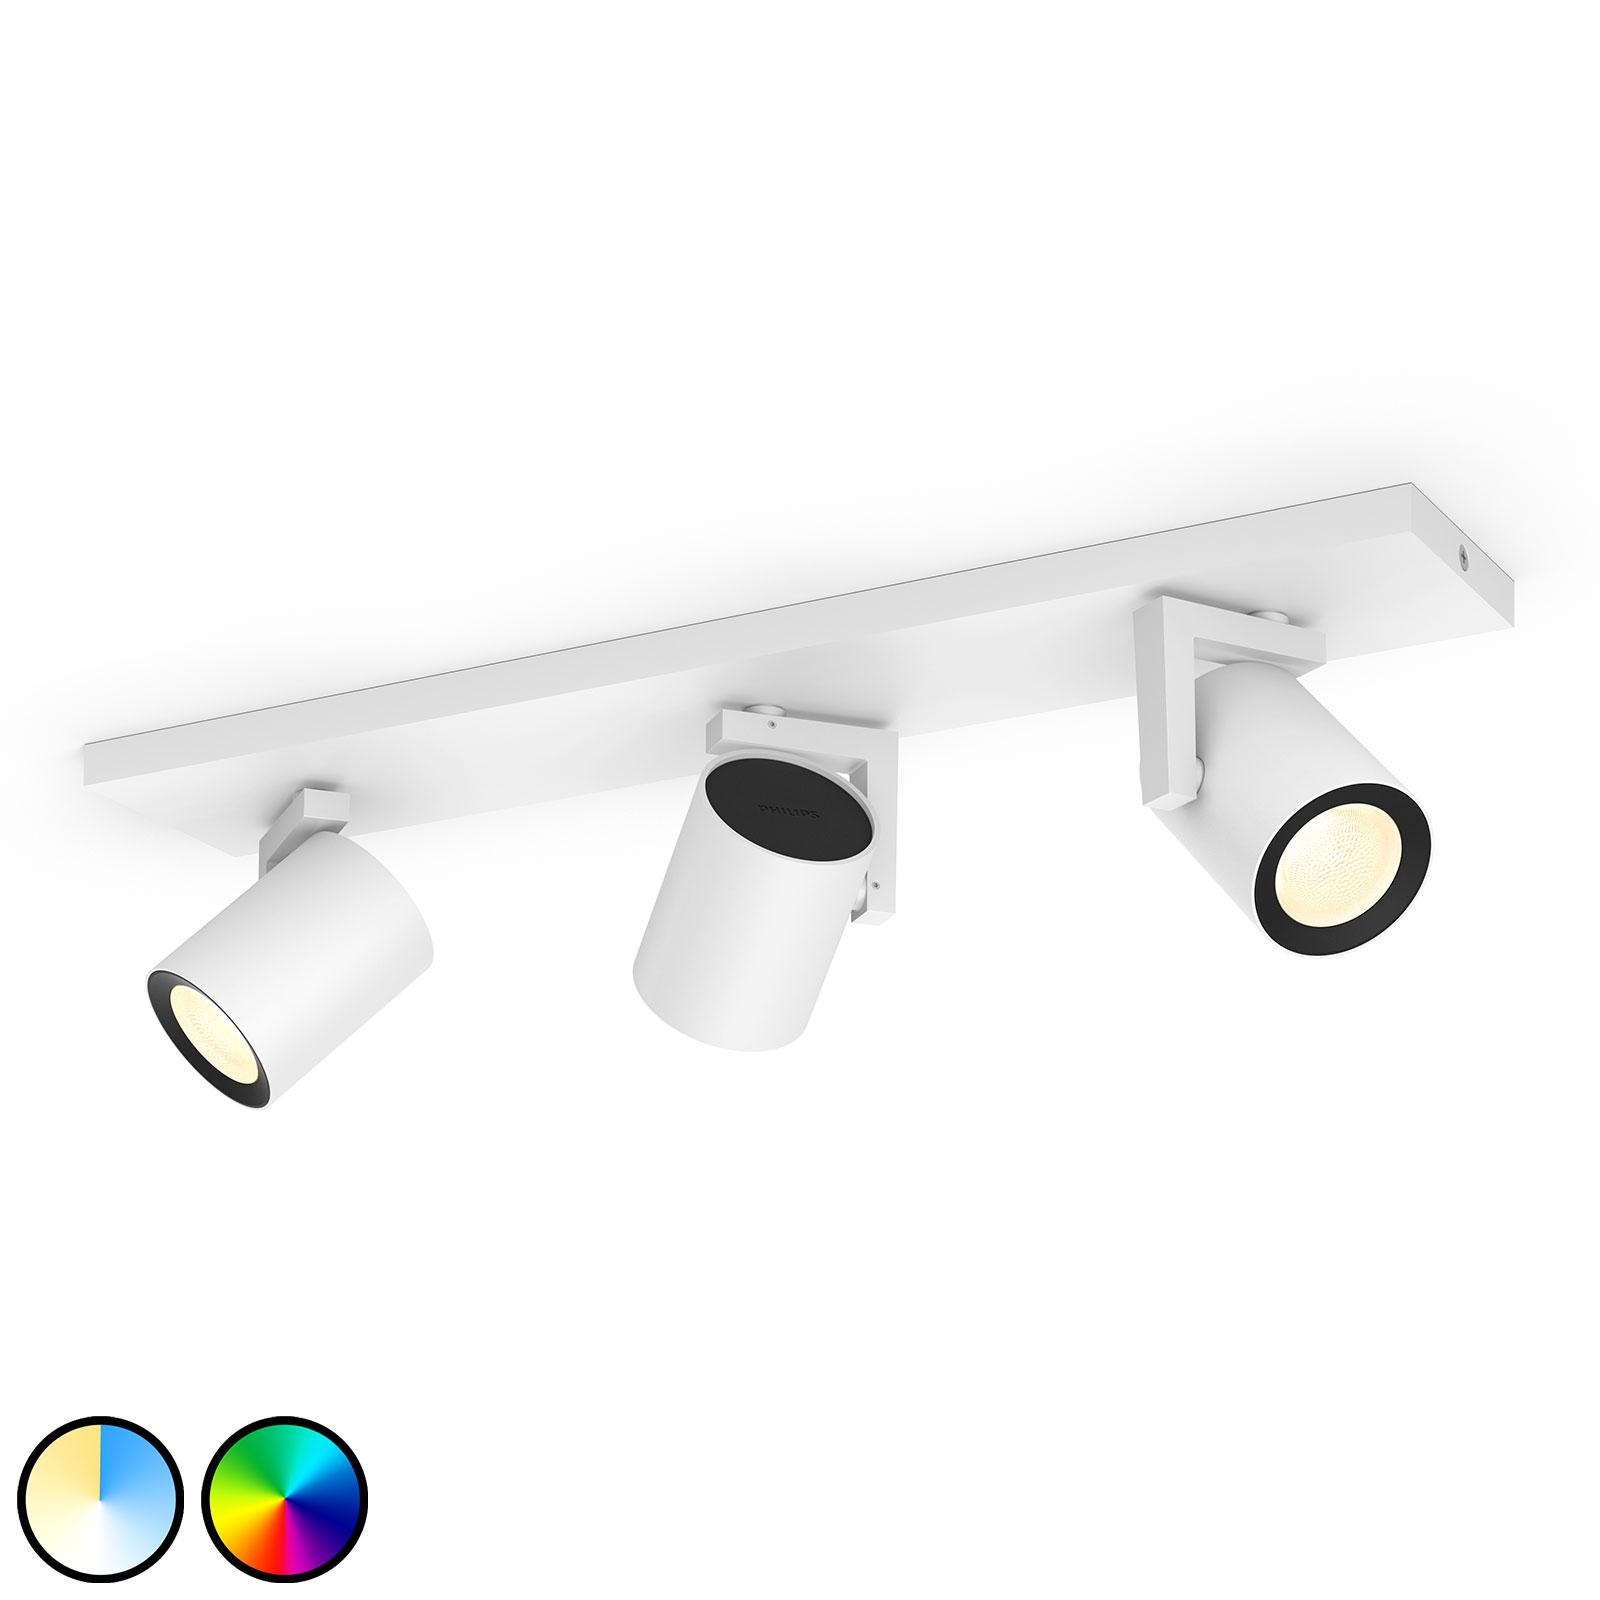 Philips Hue Argenta LED-Spot dreiflammig weiß